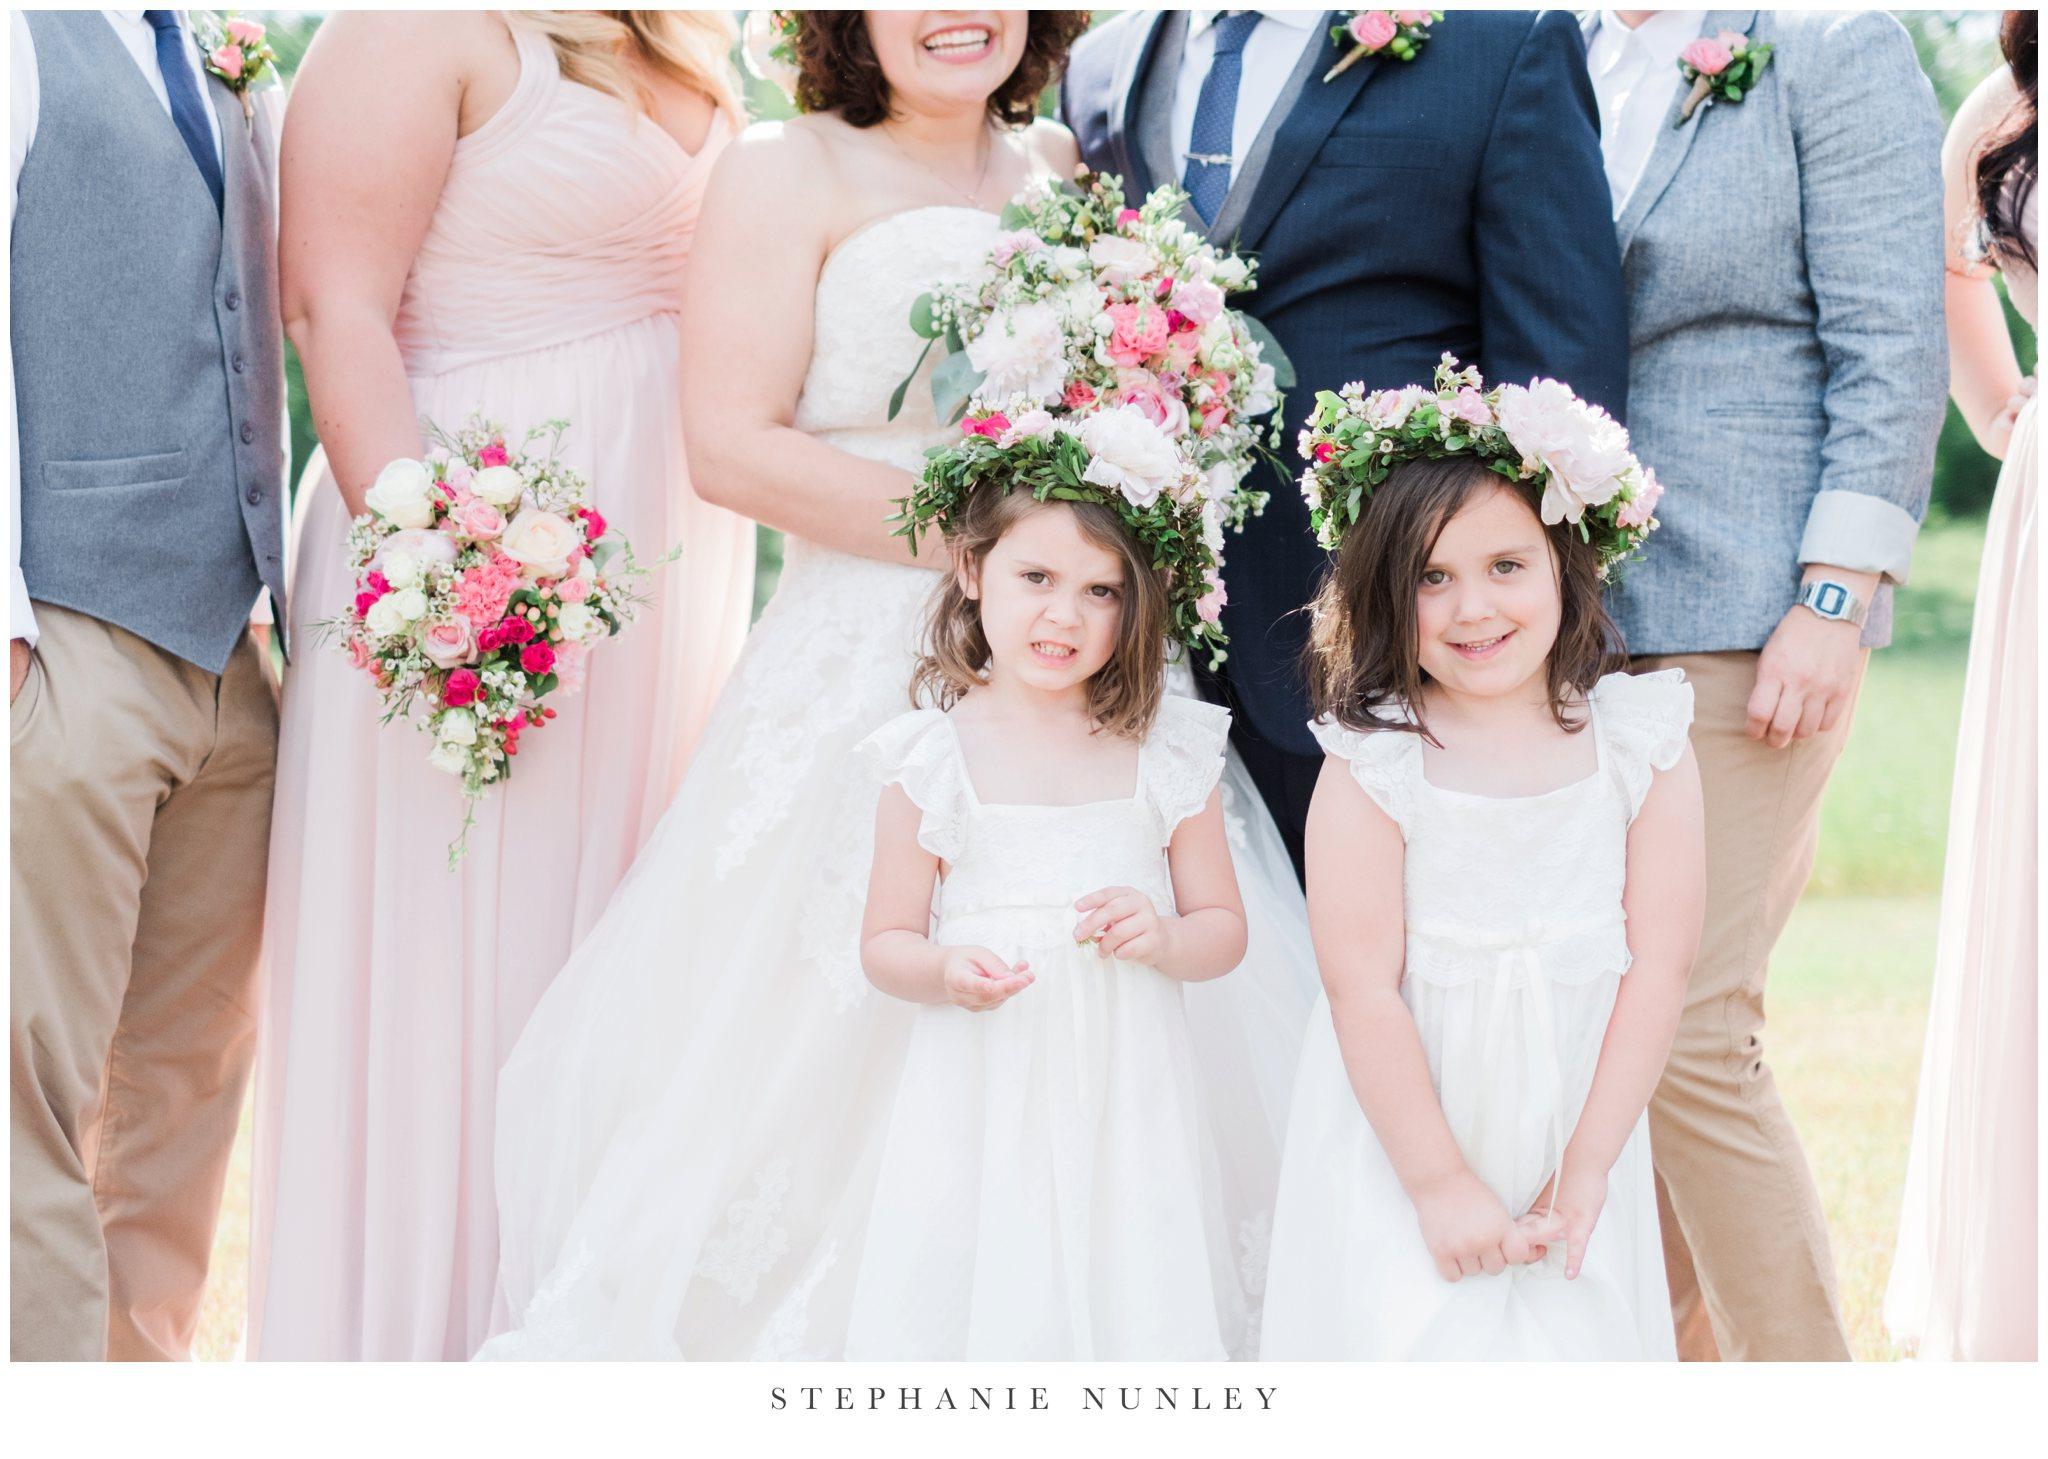 romantic-outdoor-wedding-with-flower-crown-0082.jpg